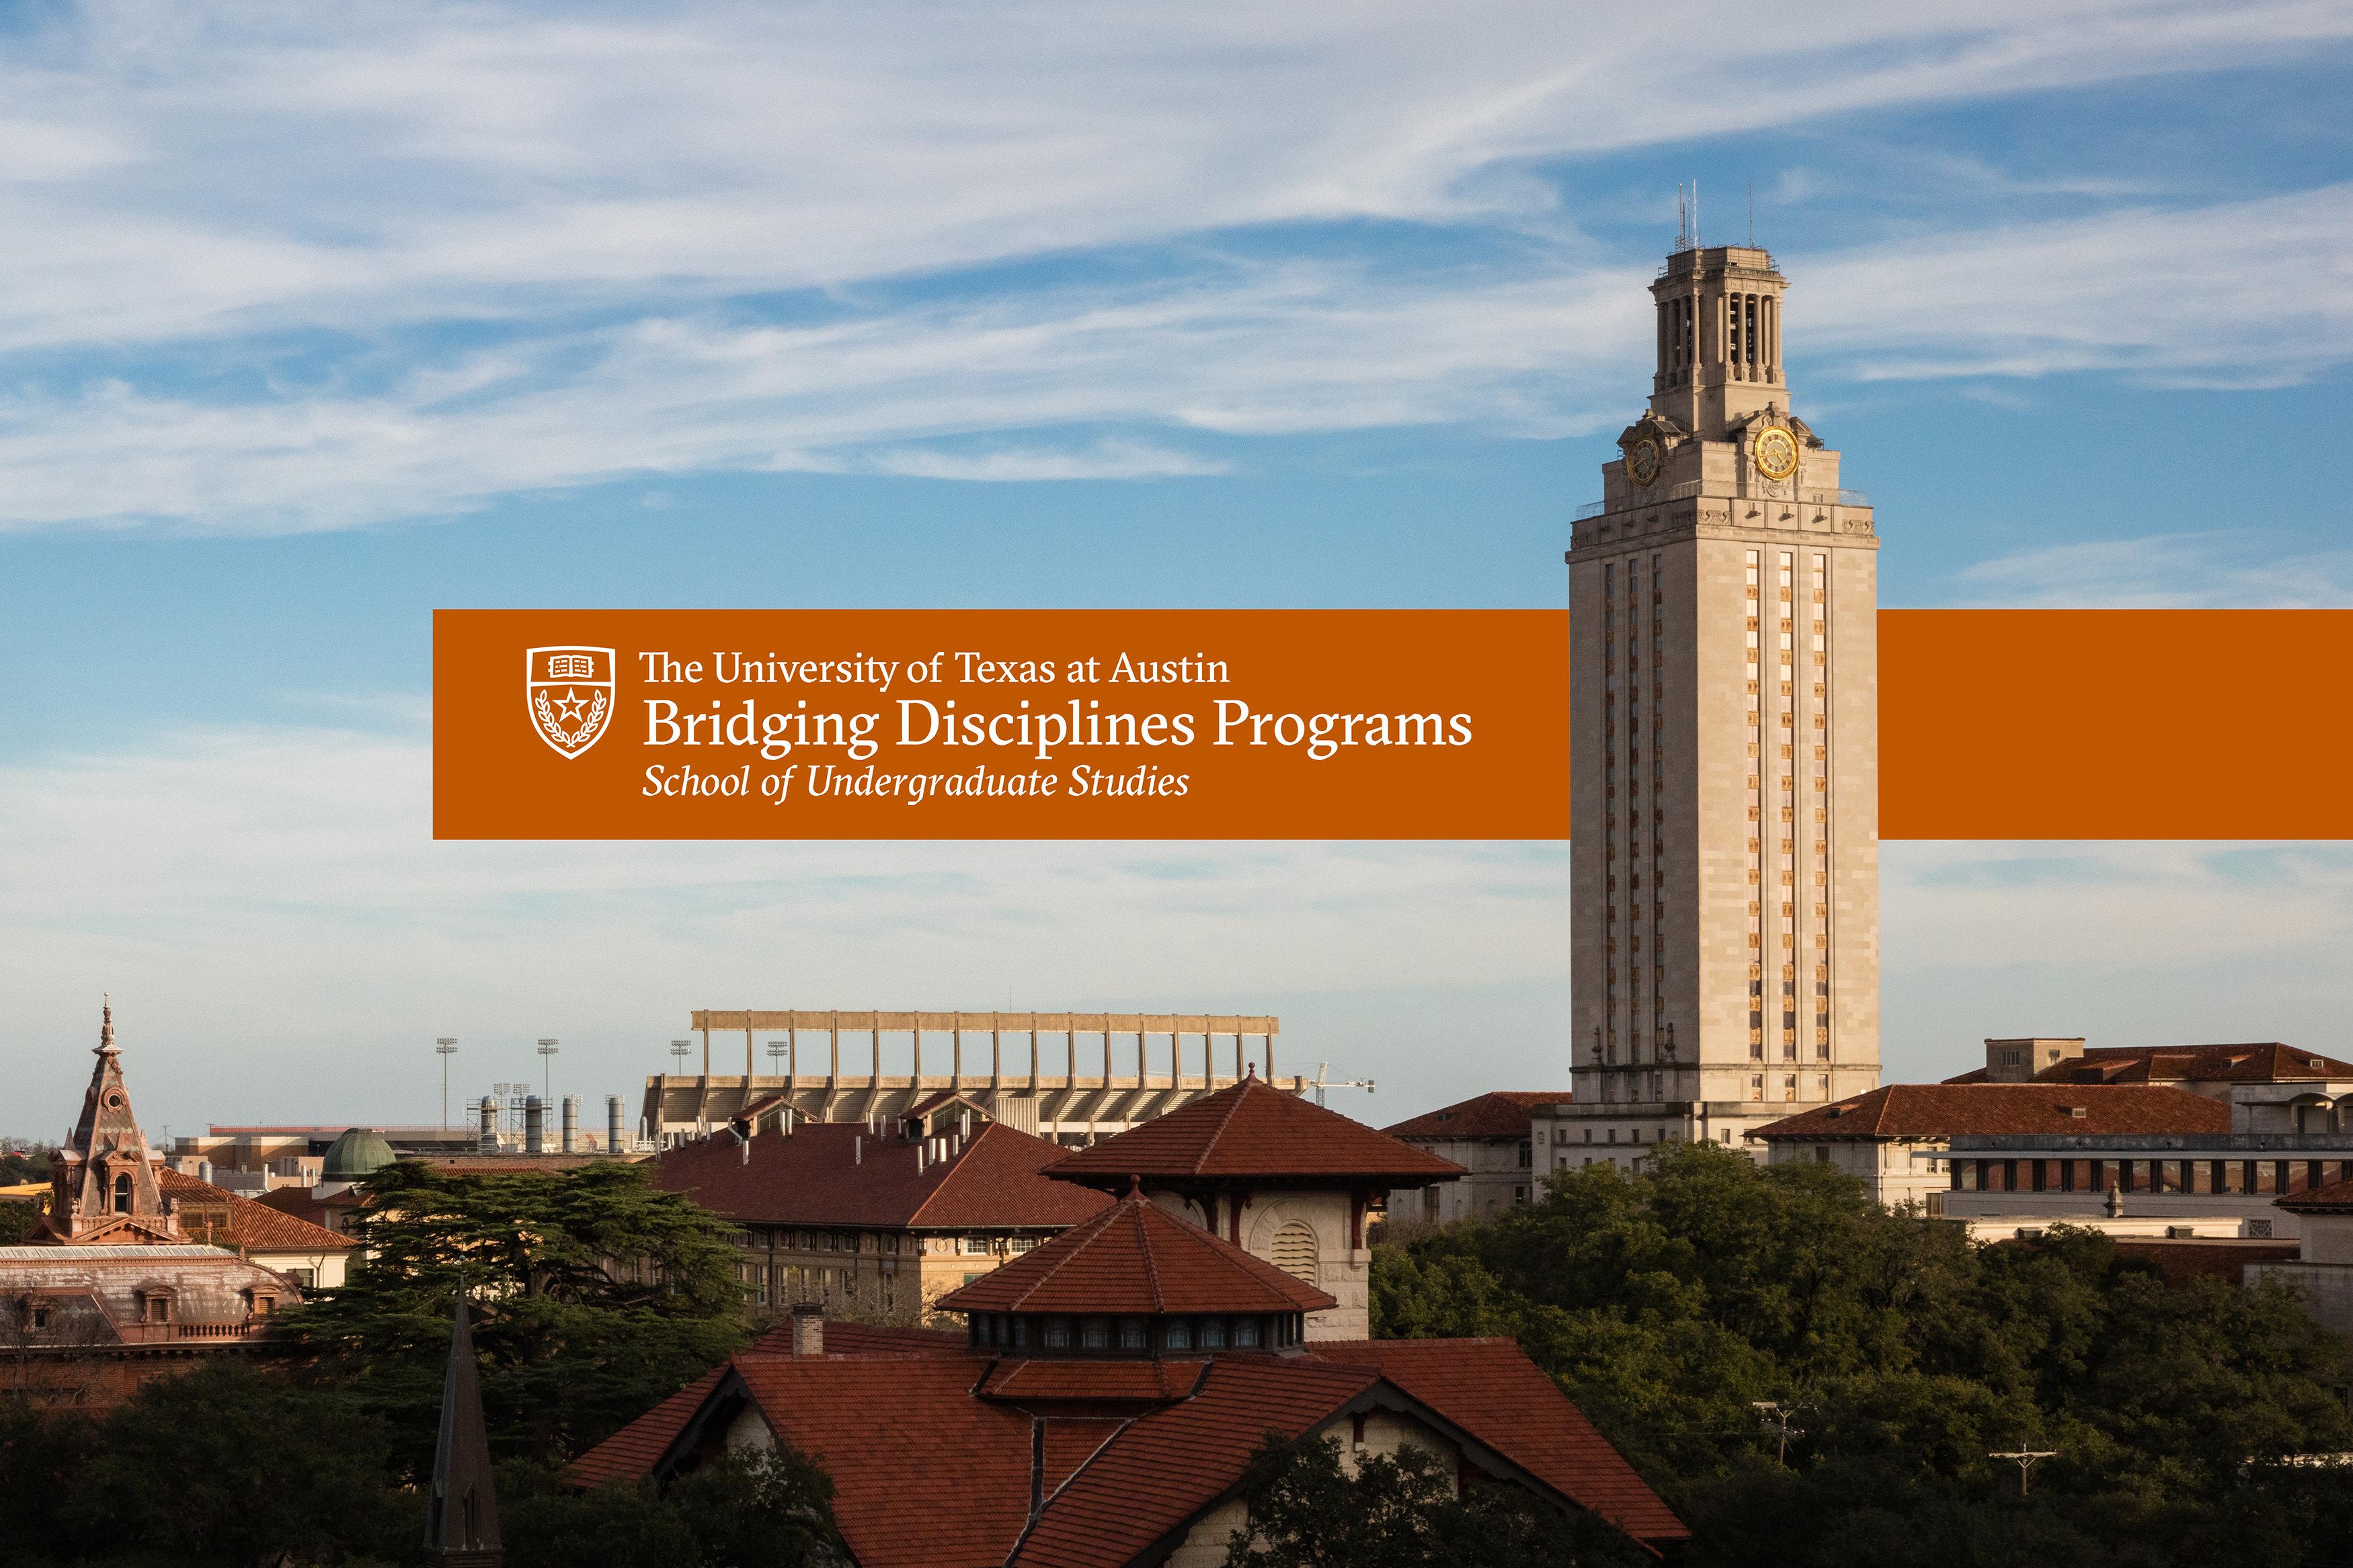 The Bridging Disciplines Programs